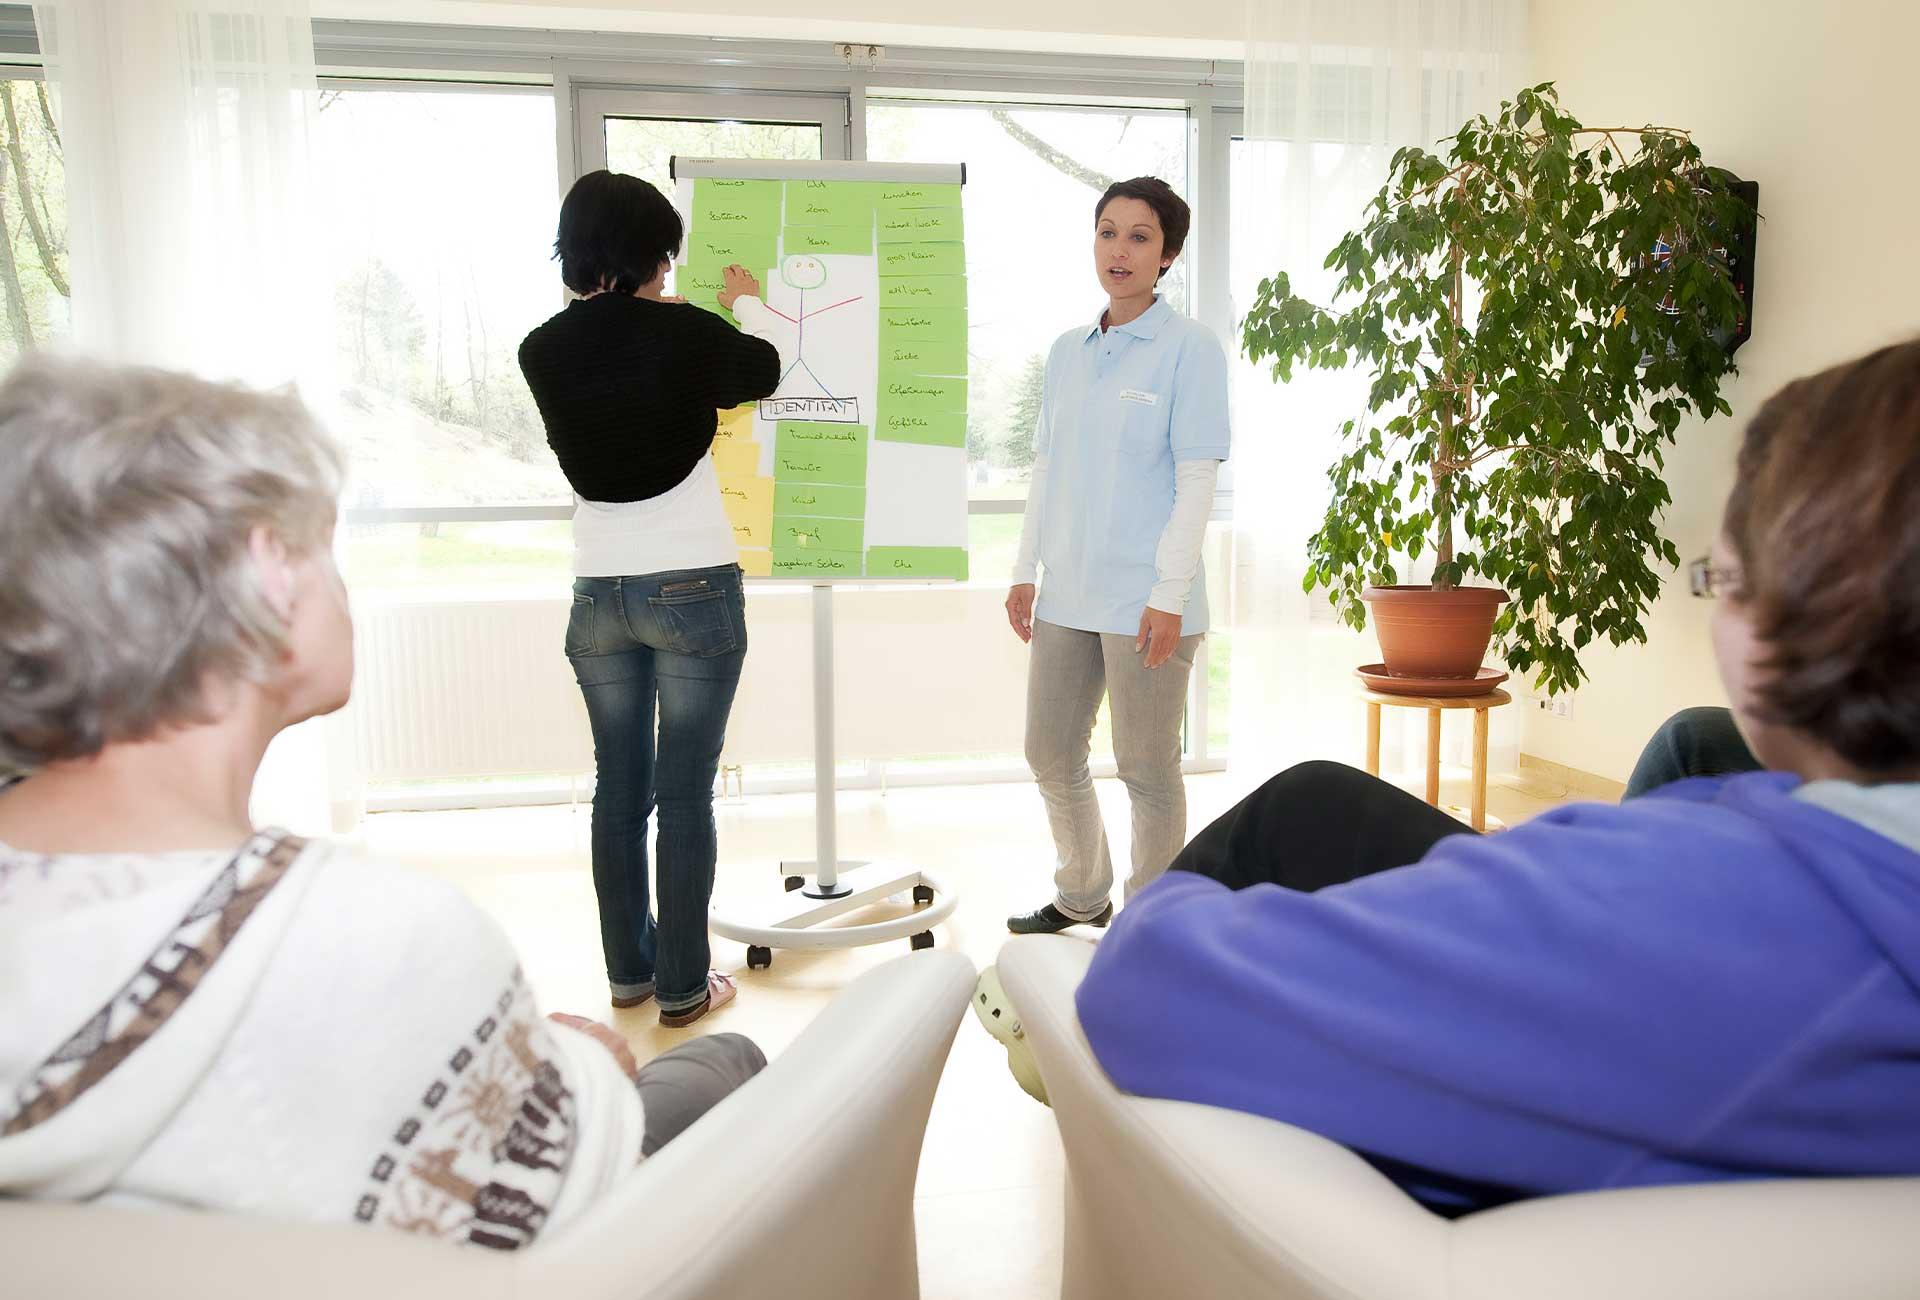 Psychotherapie - © Reinhard Podolsky/mediadesign